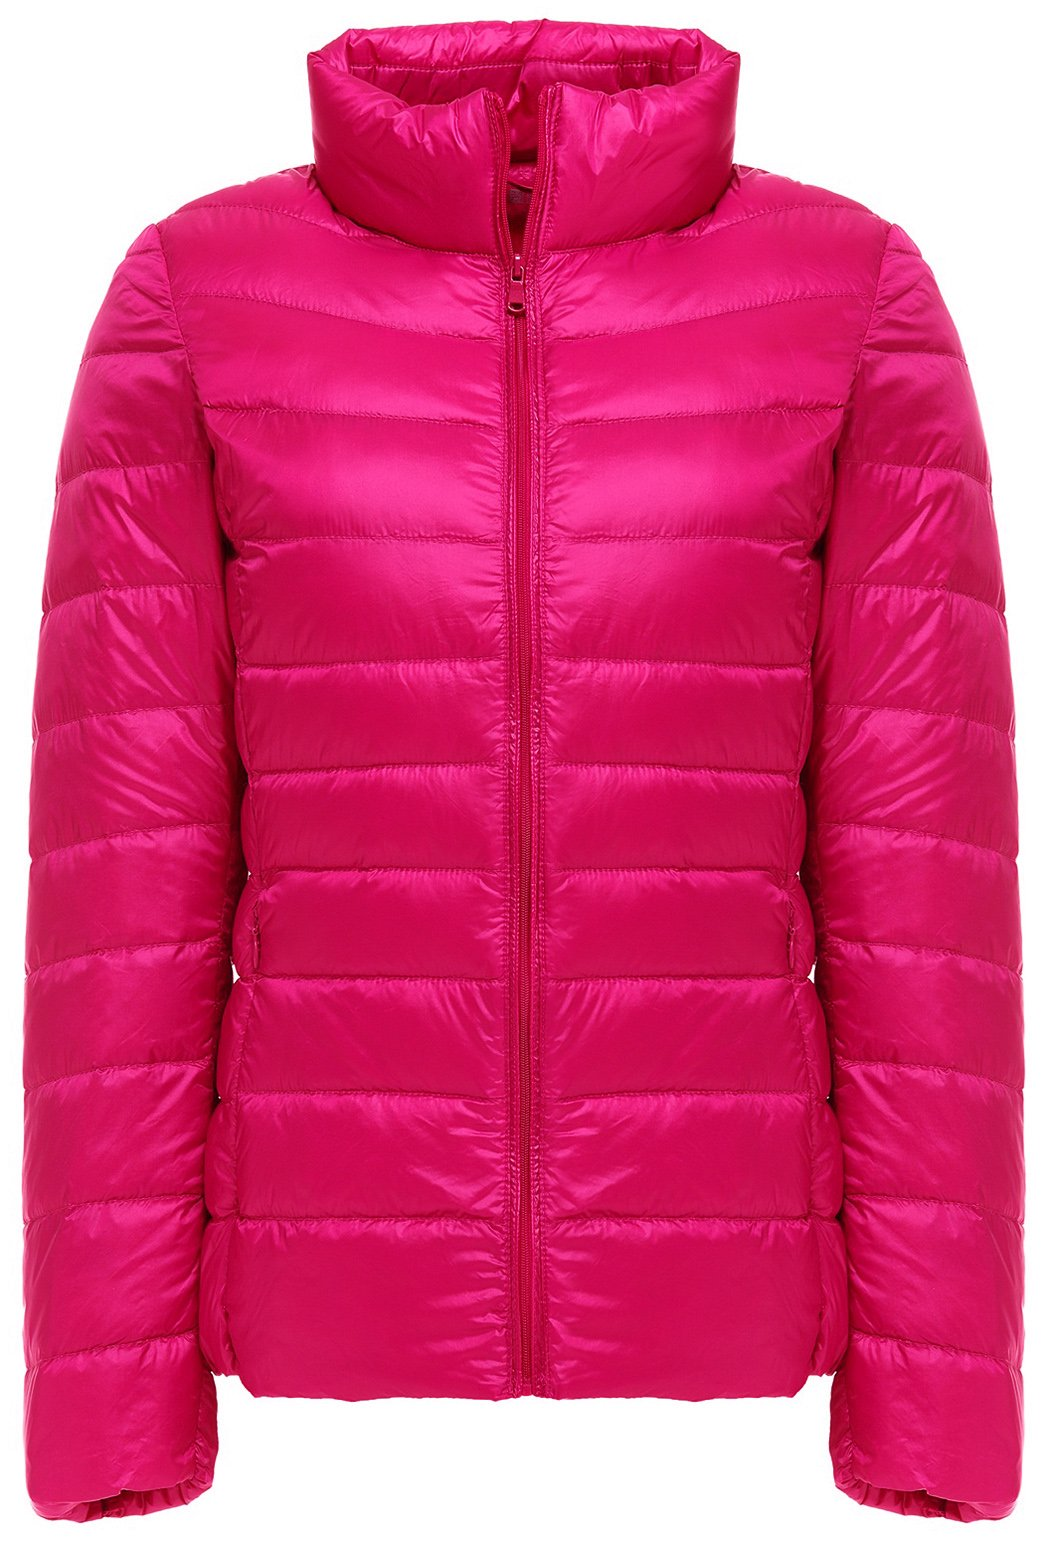 29c86aa4f27 Galleon - Sawadikaa Women s Ultra Light Packable Stand Collar Winter Pillow  Down Puffer Jacket Coat Red Large